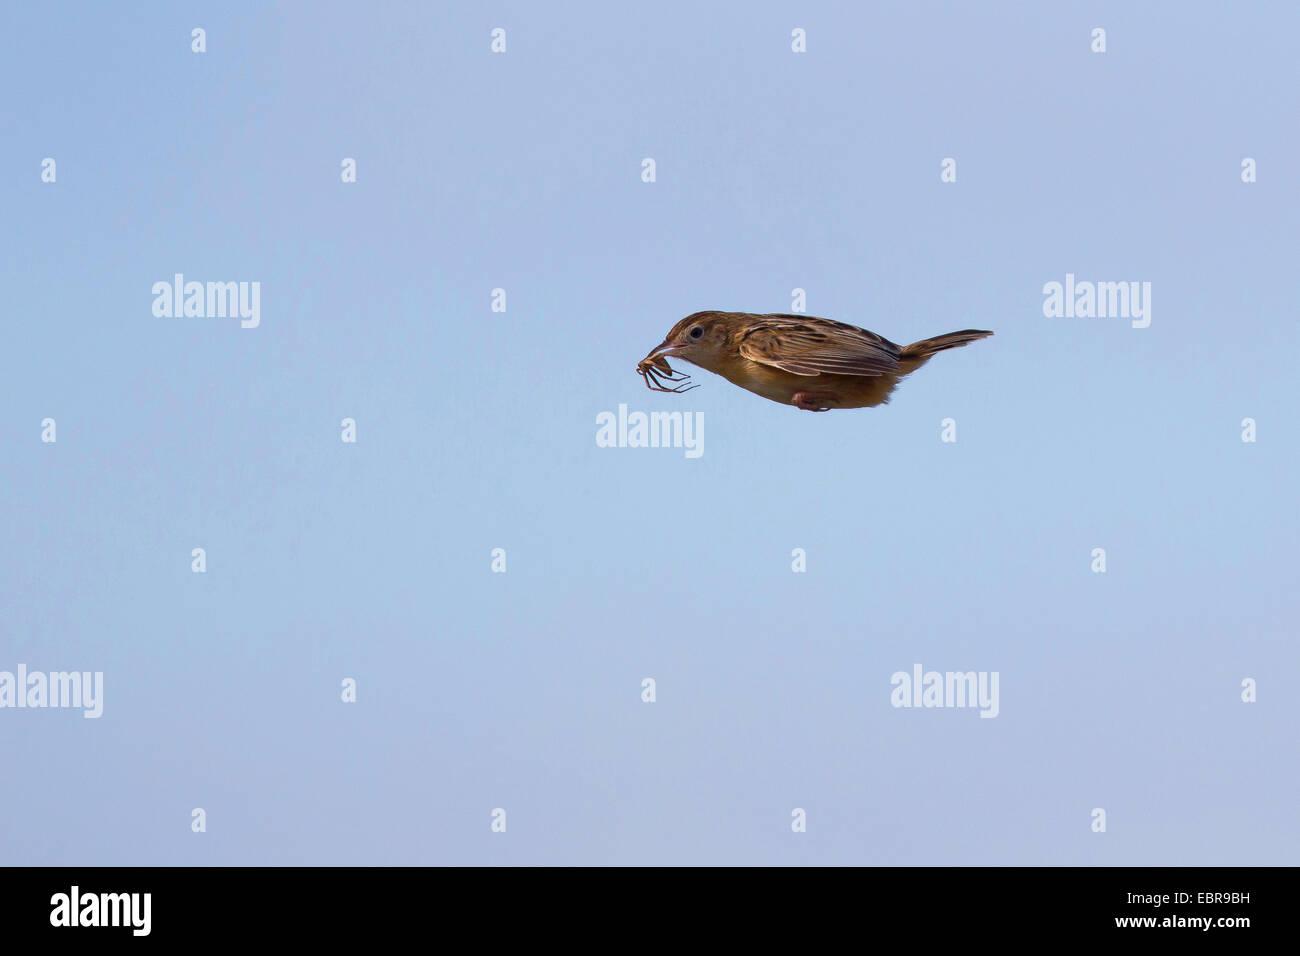 zitting cisticola (Cisticola juncidis), in flight with prey in the bill - Stock Image